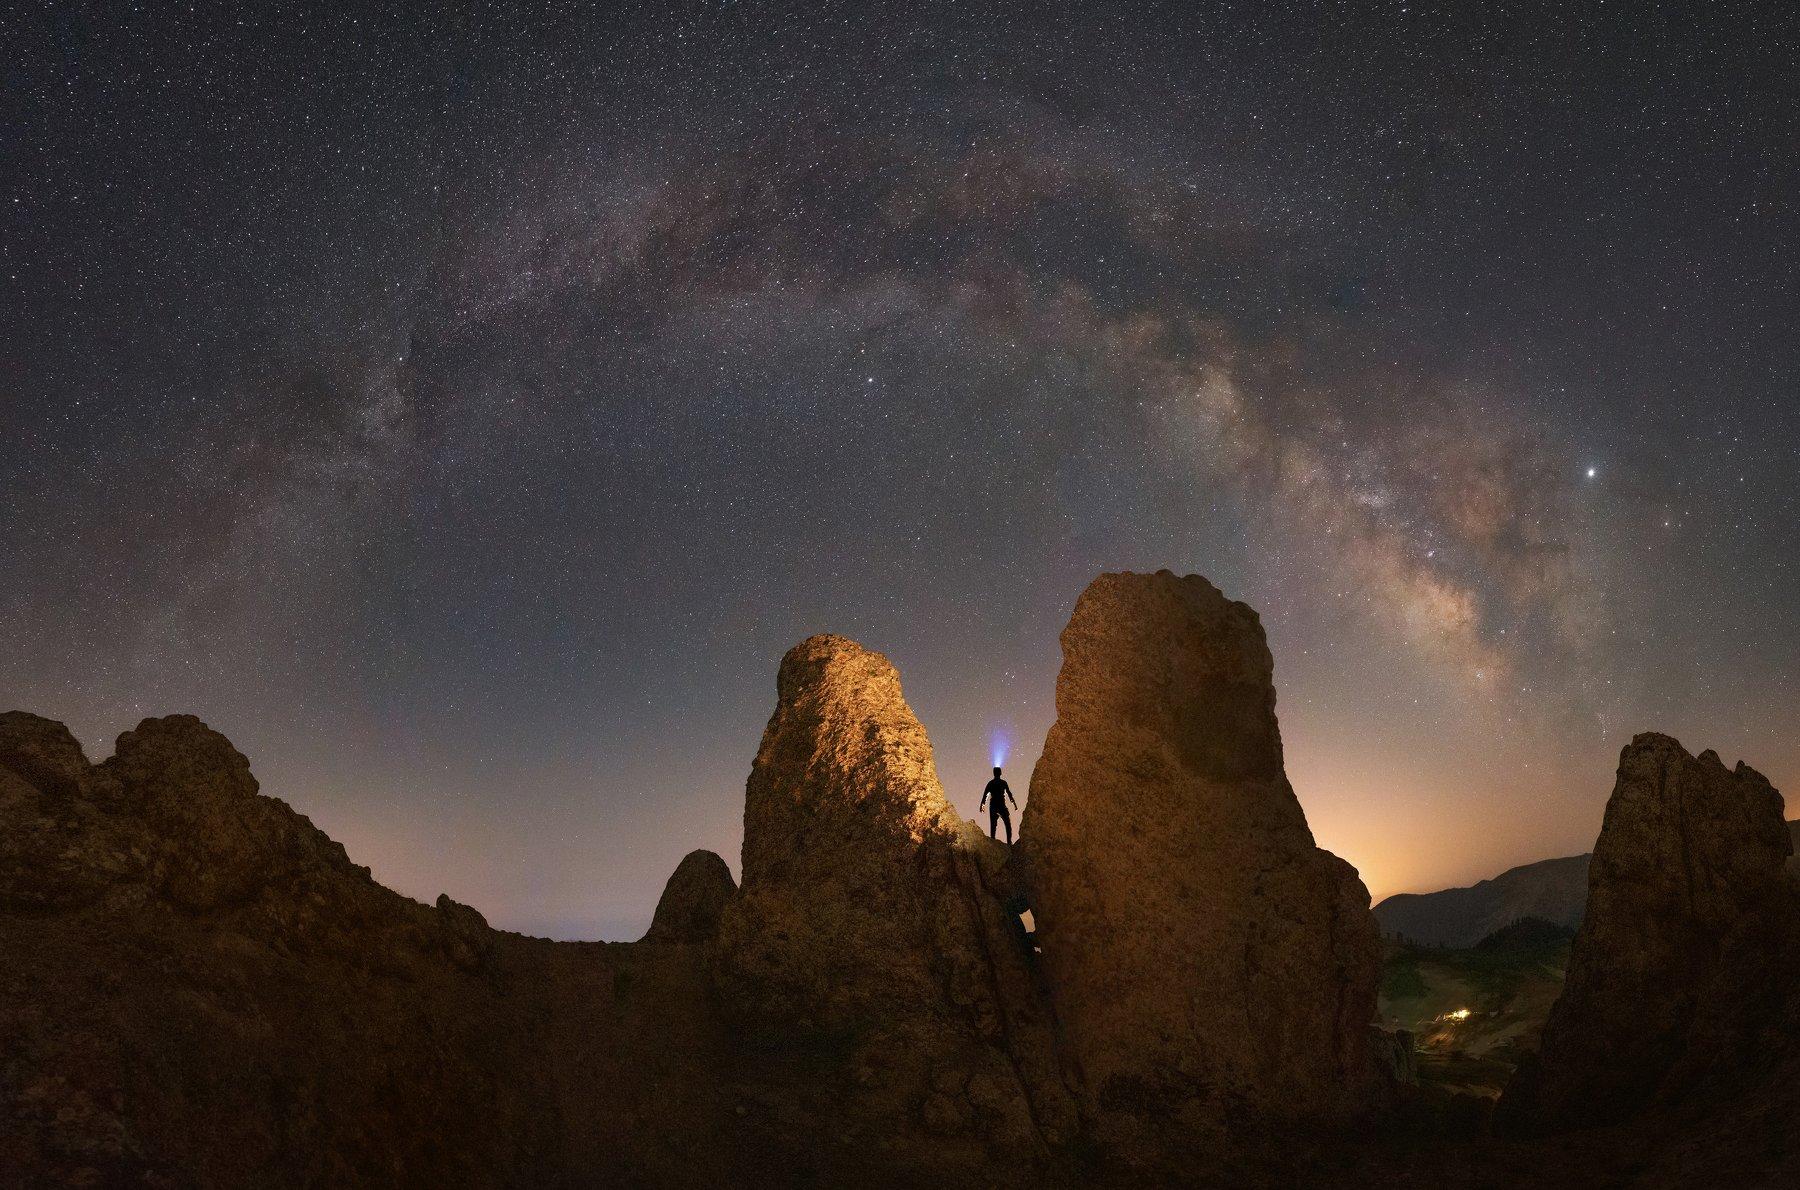 nightscape milkyway panorama, Mirsadeghi Pedram